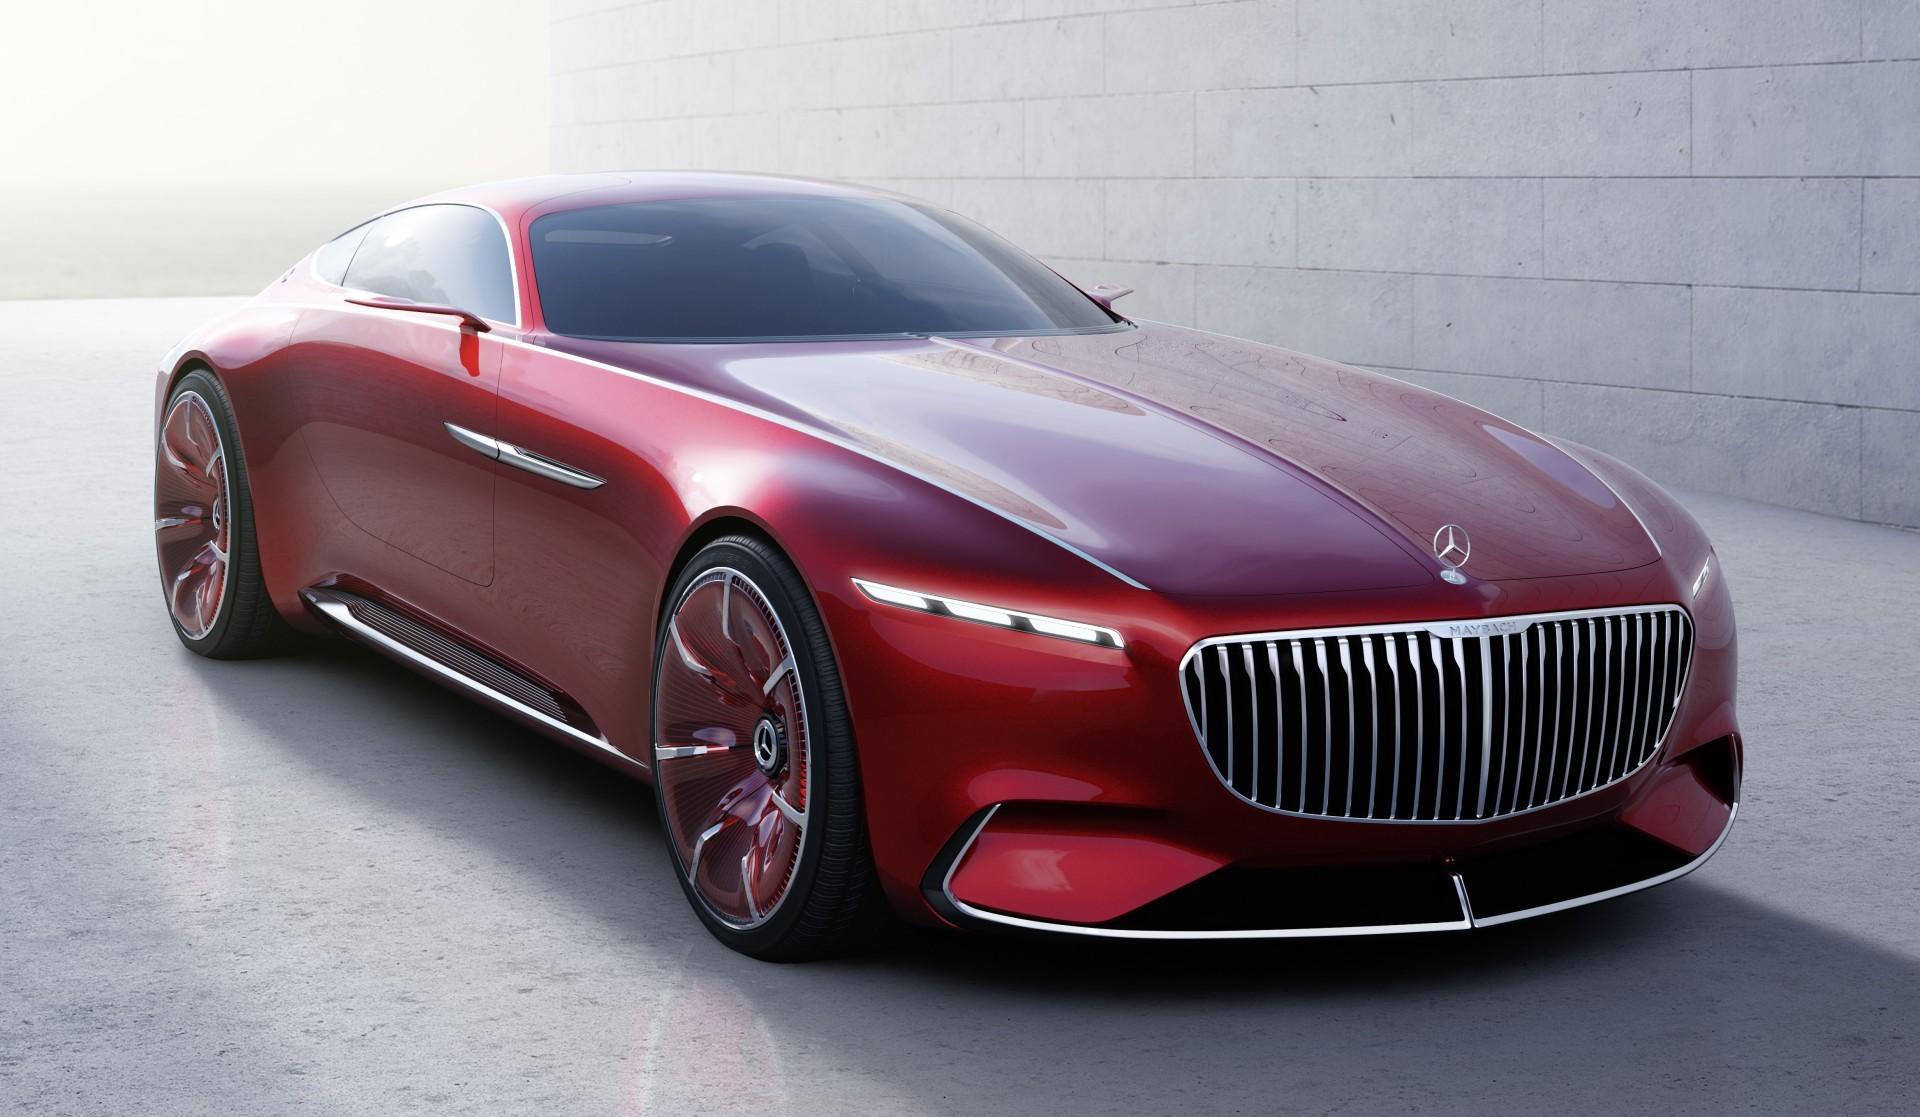 Проект шестиметрового электрокара Vision Mercedes-Maybach 6 - 1